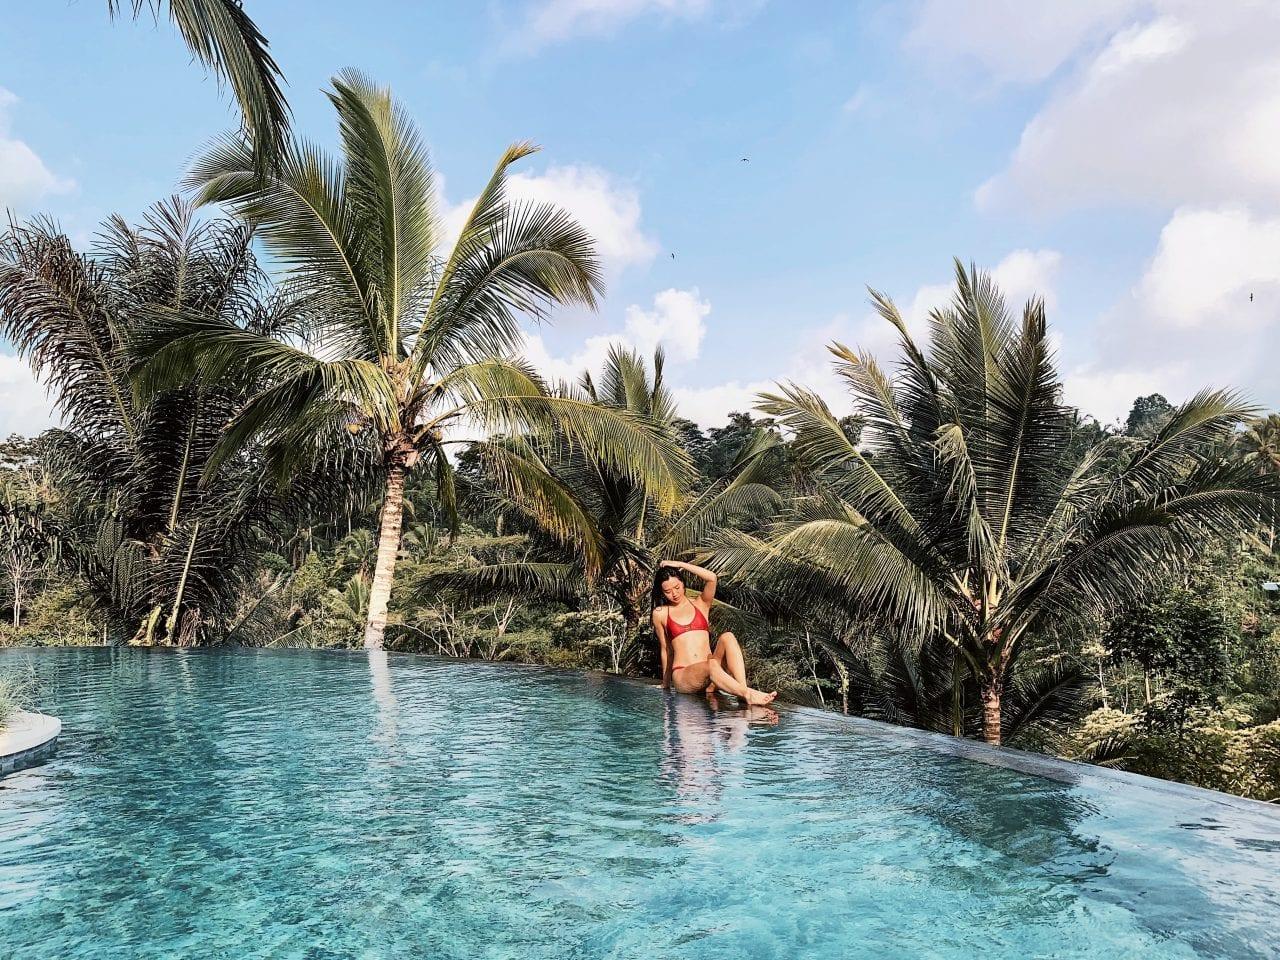 MagLoft Internship in Bali – Why I Left My Full-Time Job